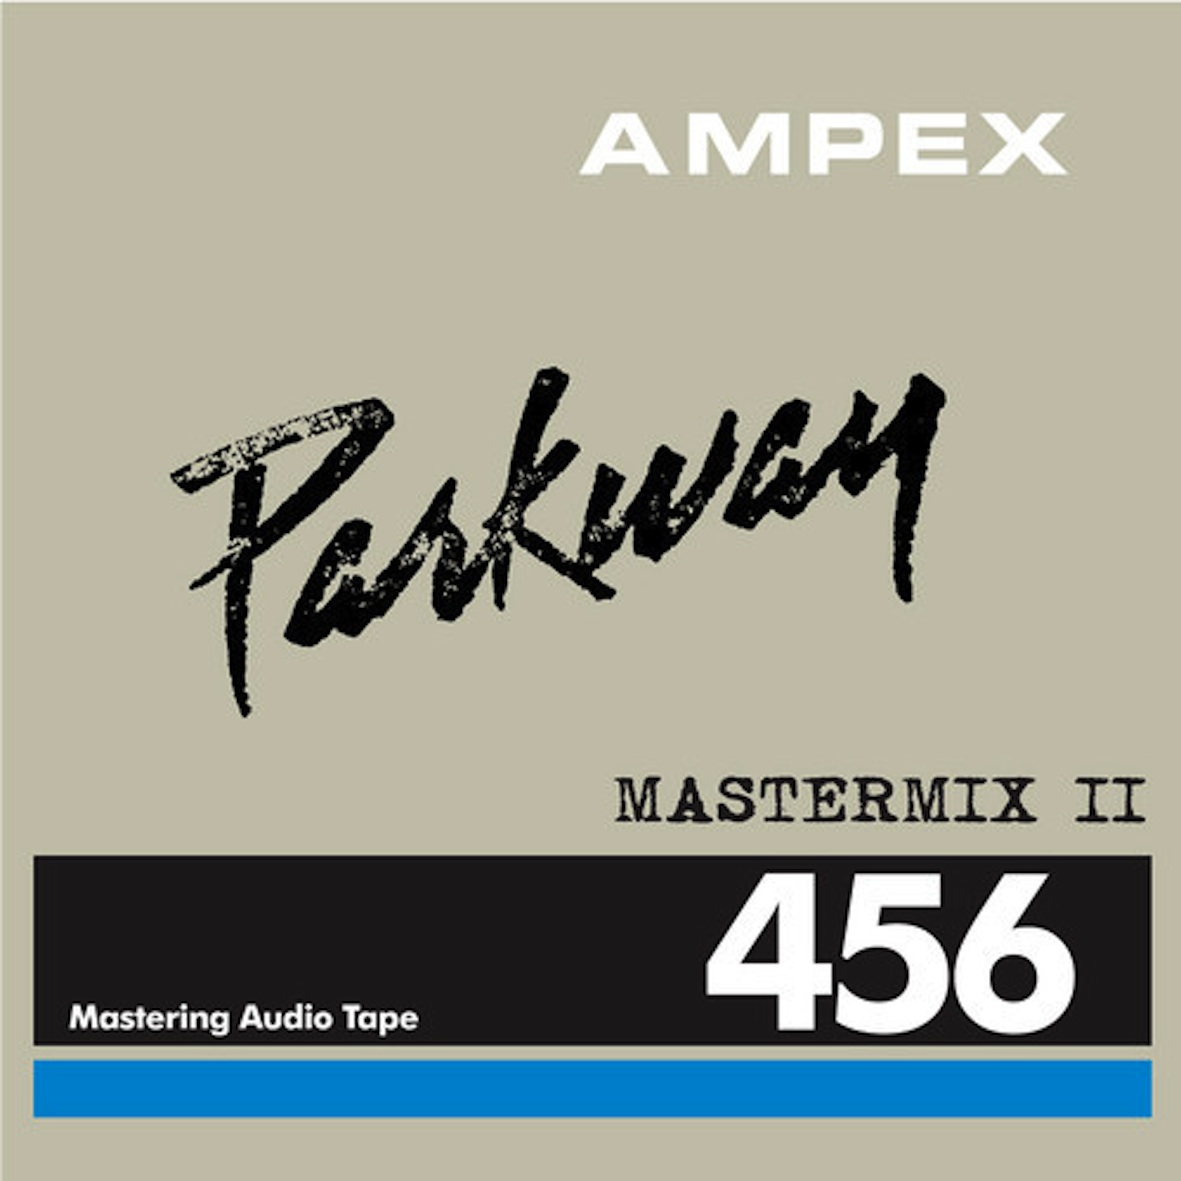 Test pressing, Mixes, Mark Seven, Dr Rob, Parkway Mastermix, Vol. II, Jus`Wax, Parkwest